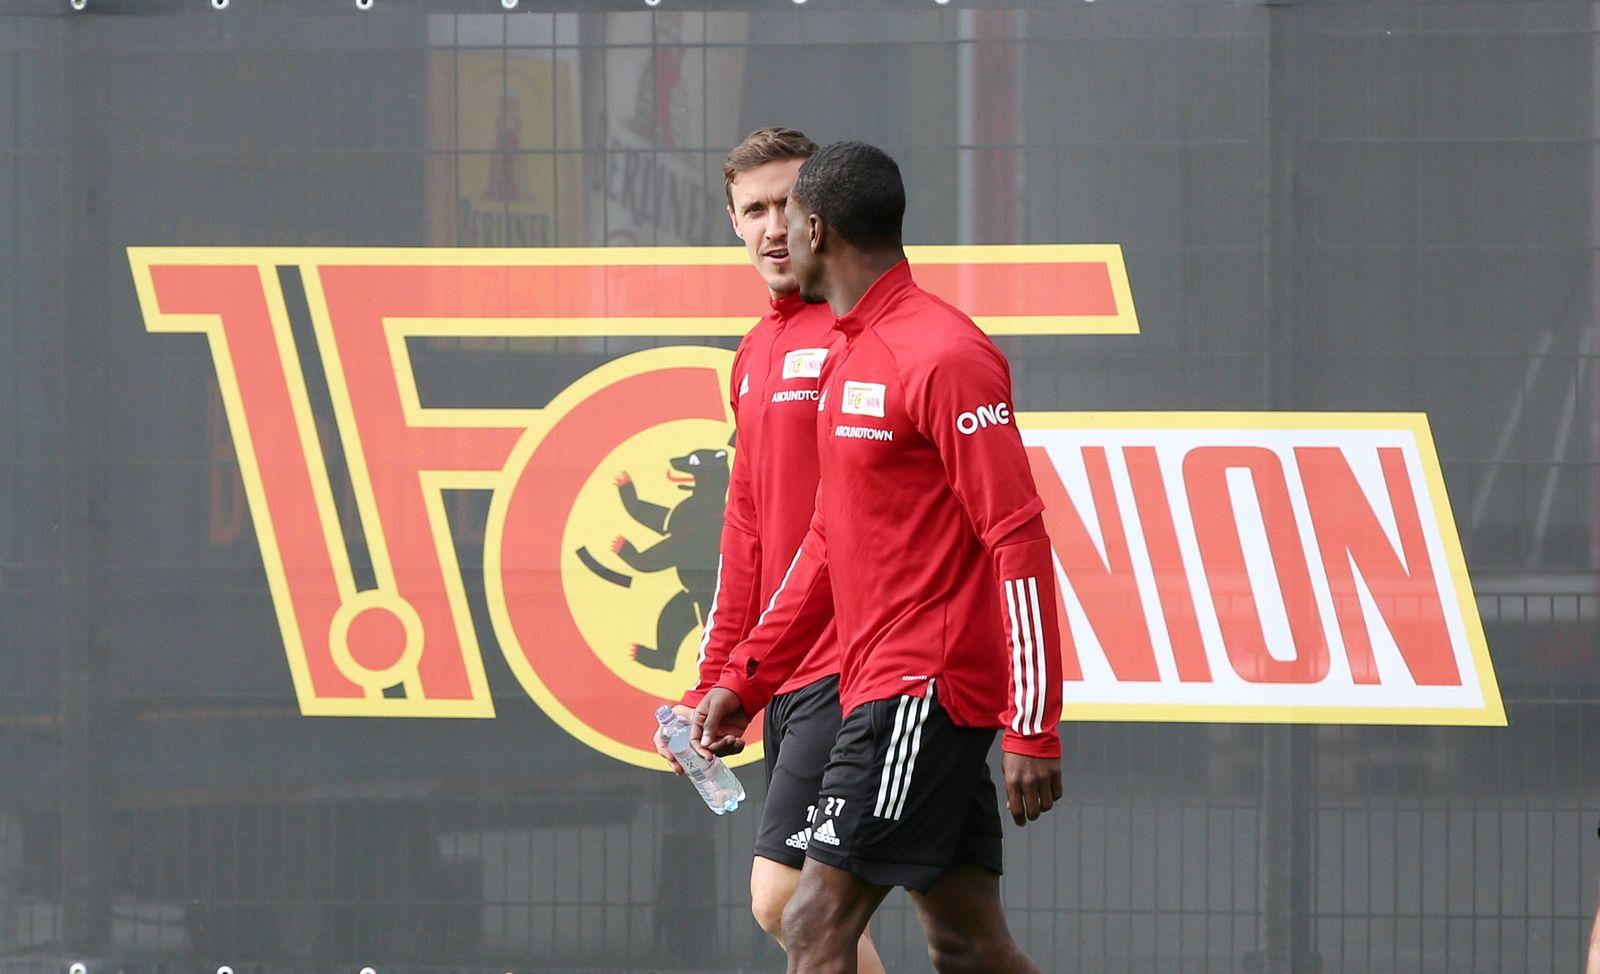 Max Kruse, Sheraldo Becker / / Fußball Fussball / Training / 1.Bundesliga Herren DFL / Saison 2020/2021 / 02.09.2020 /